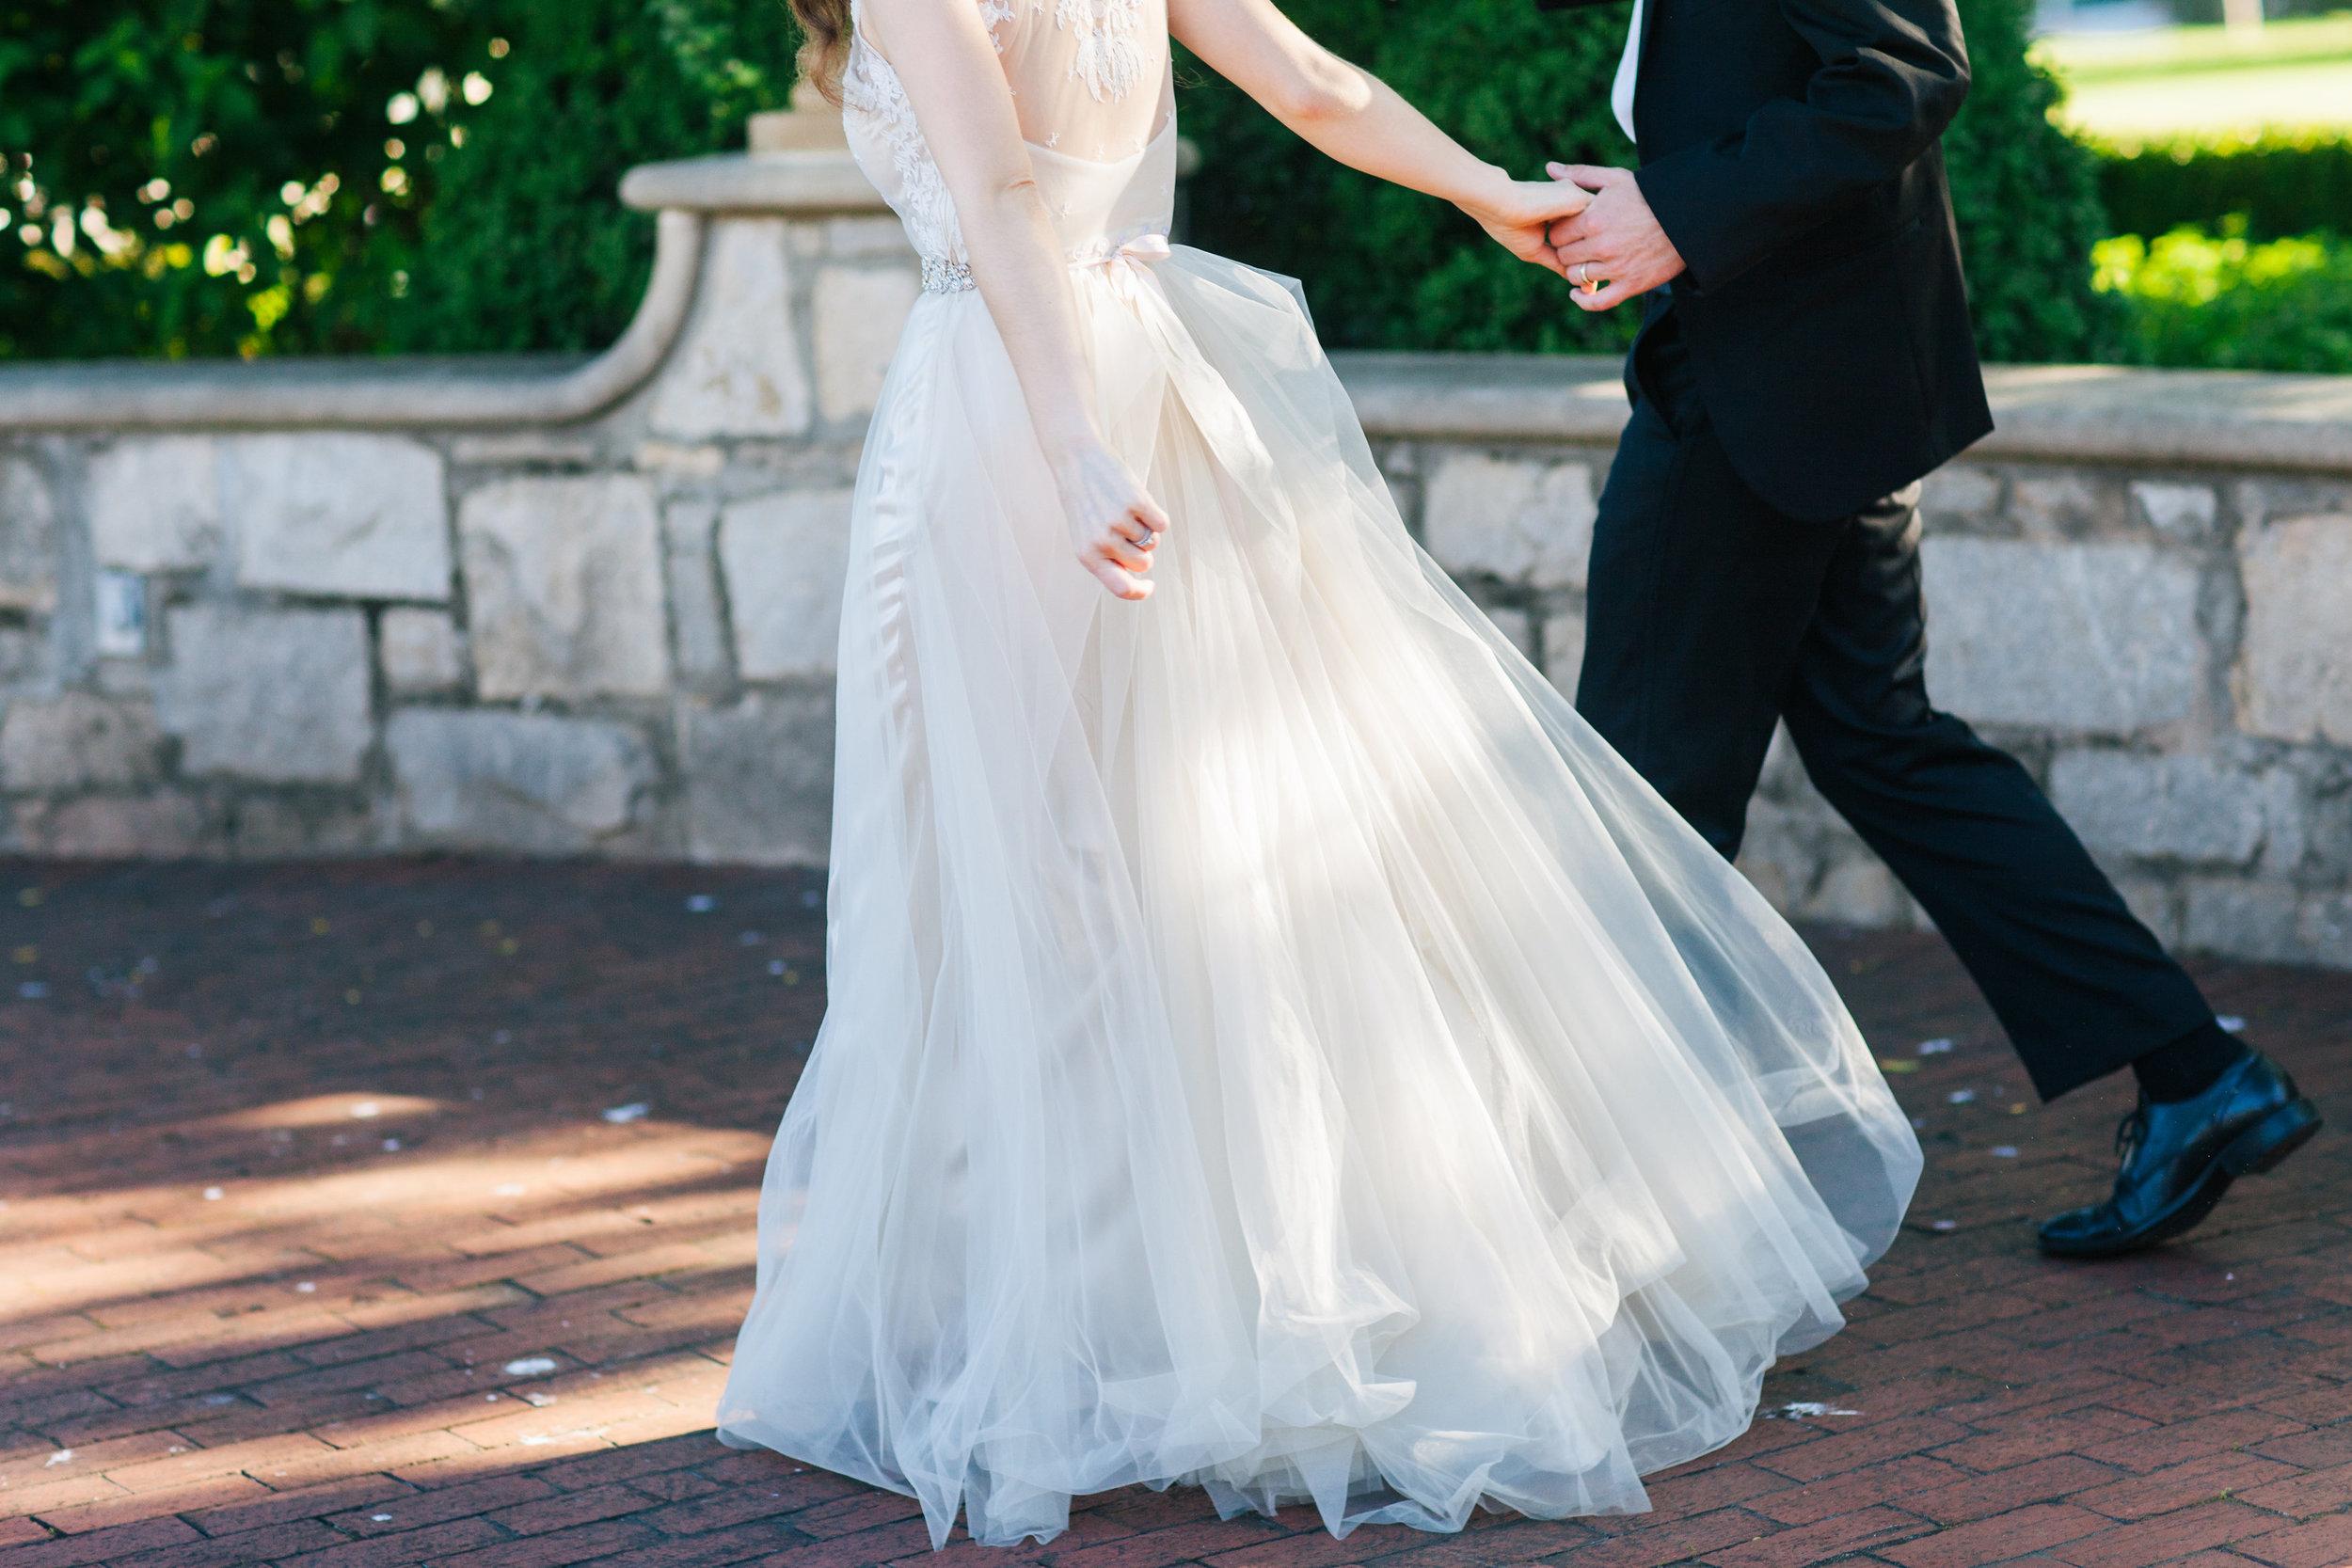 Weddings   Engagement/ Bridal/ Wedding Photography  WeddingFlorals  Wedding Day Photo Styling  Invitation Suites  Ceremony & Reception Styling